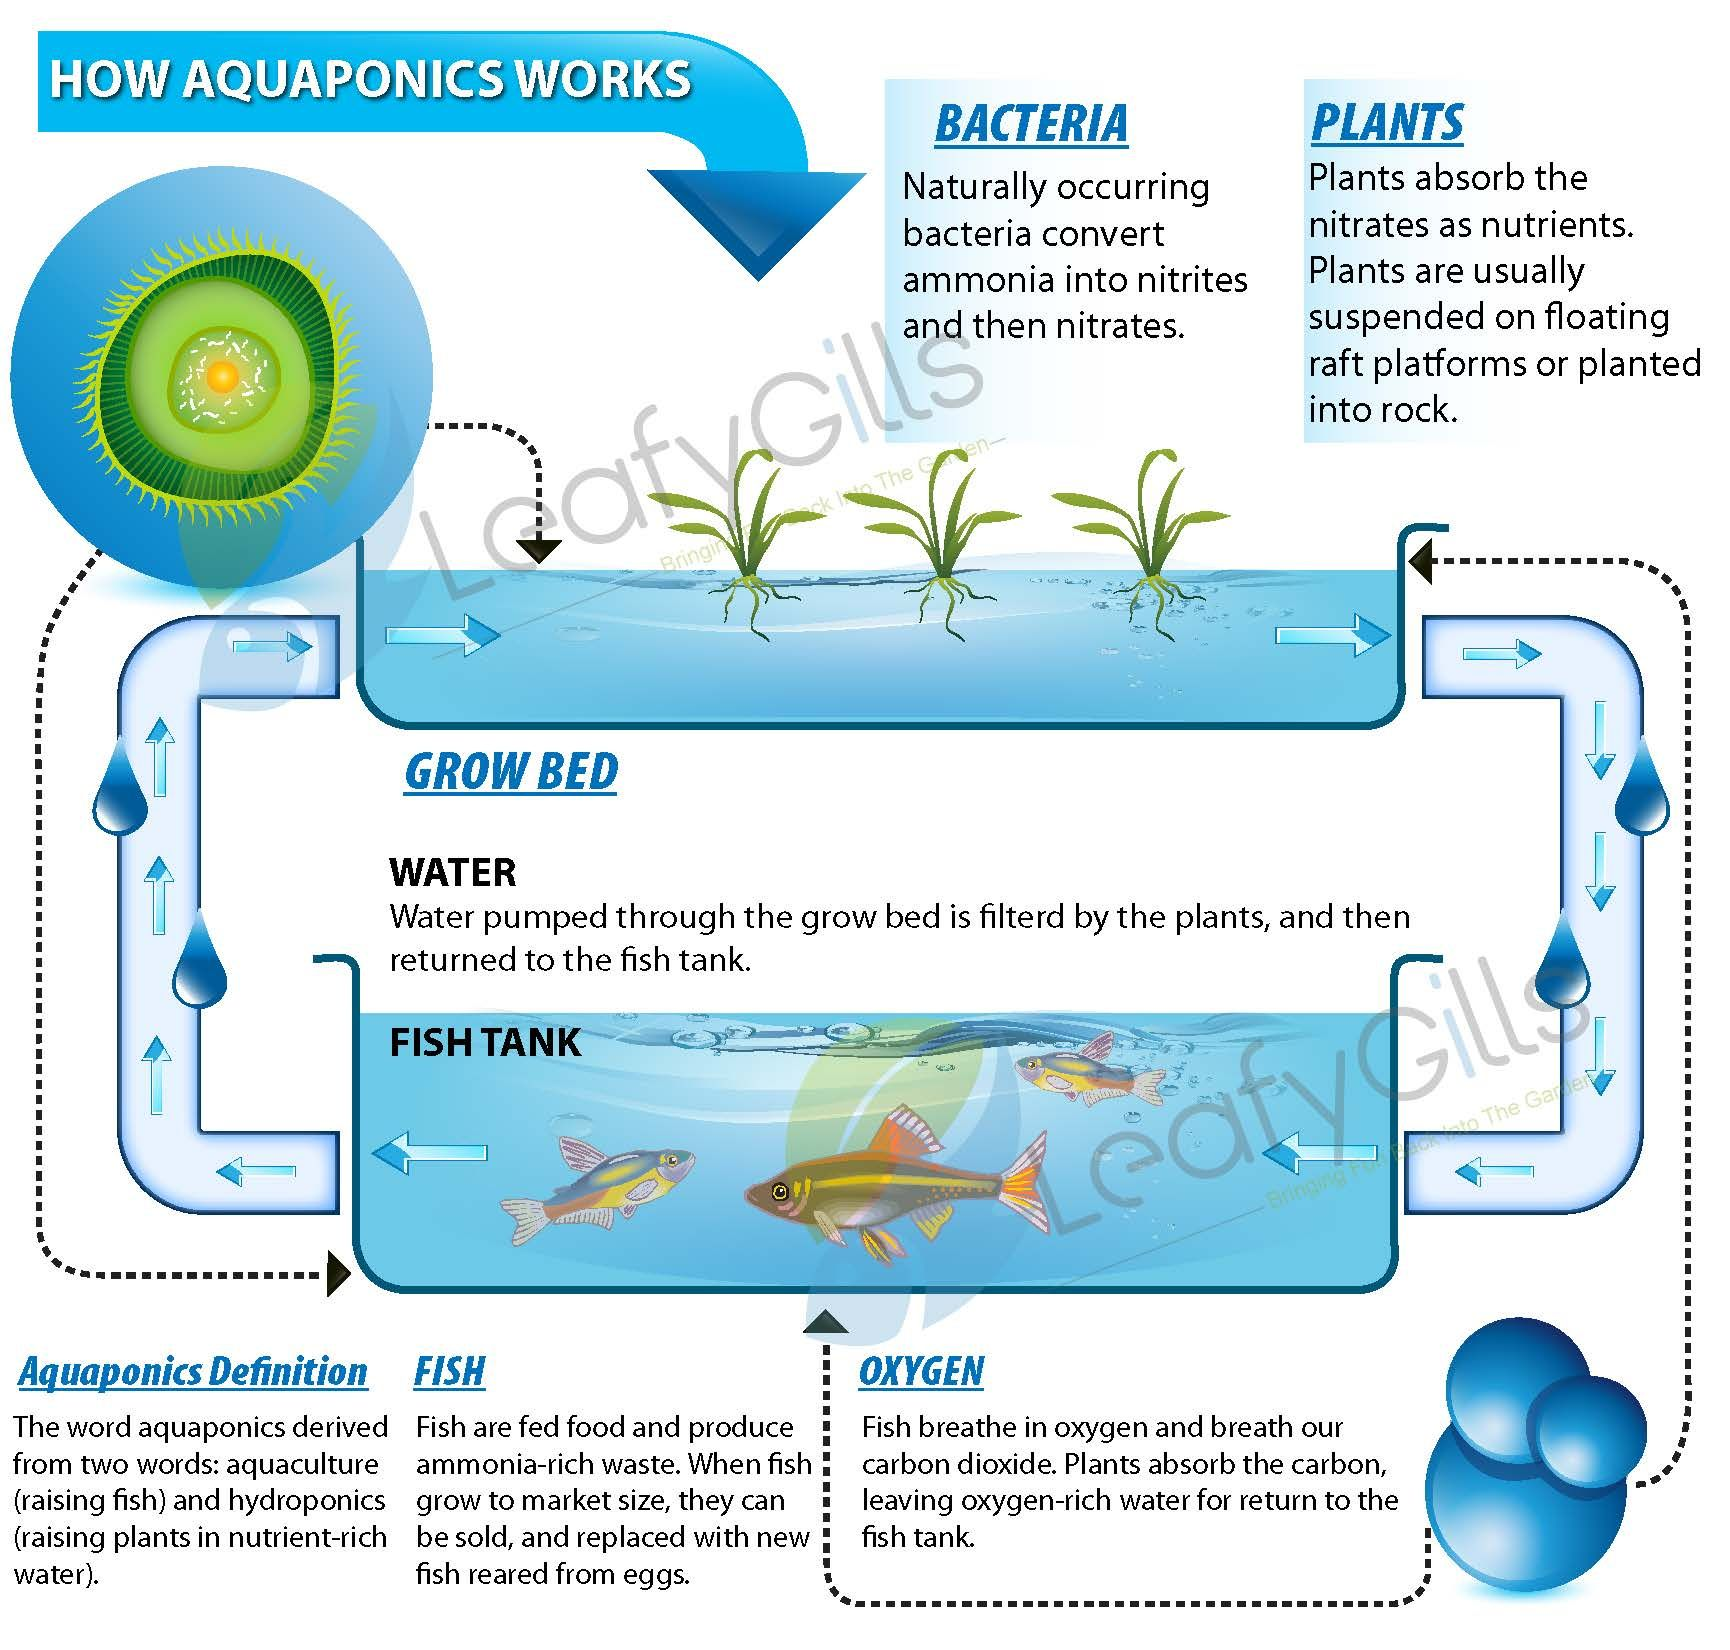 small resolution of aquaponics system the benefits of aquaponics include